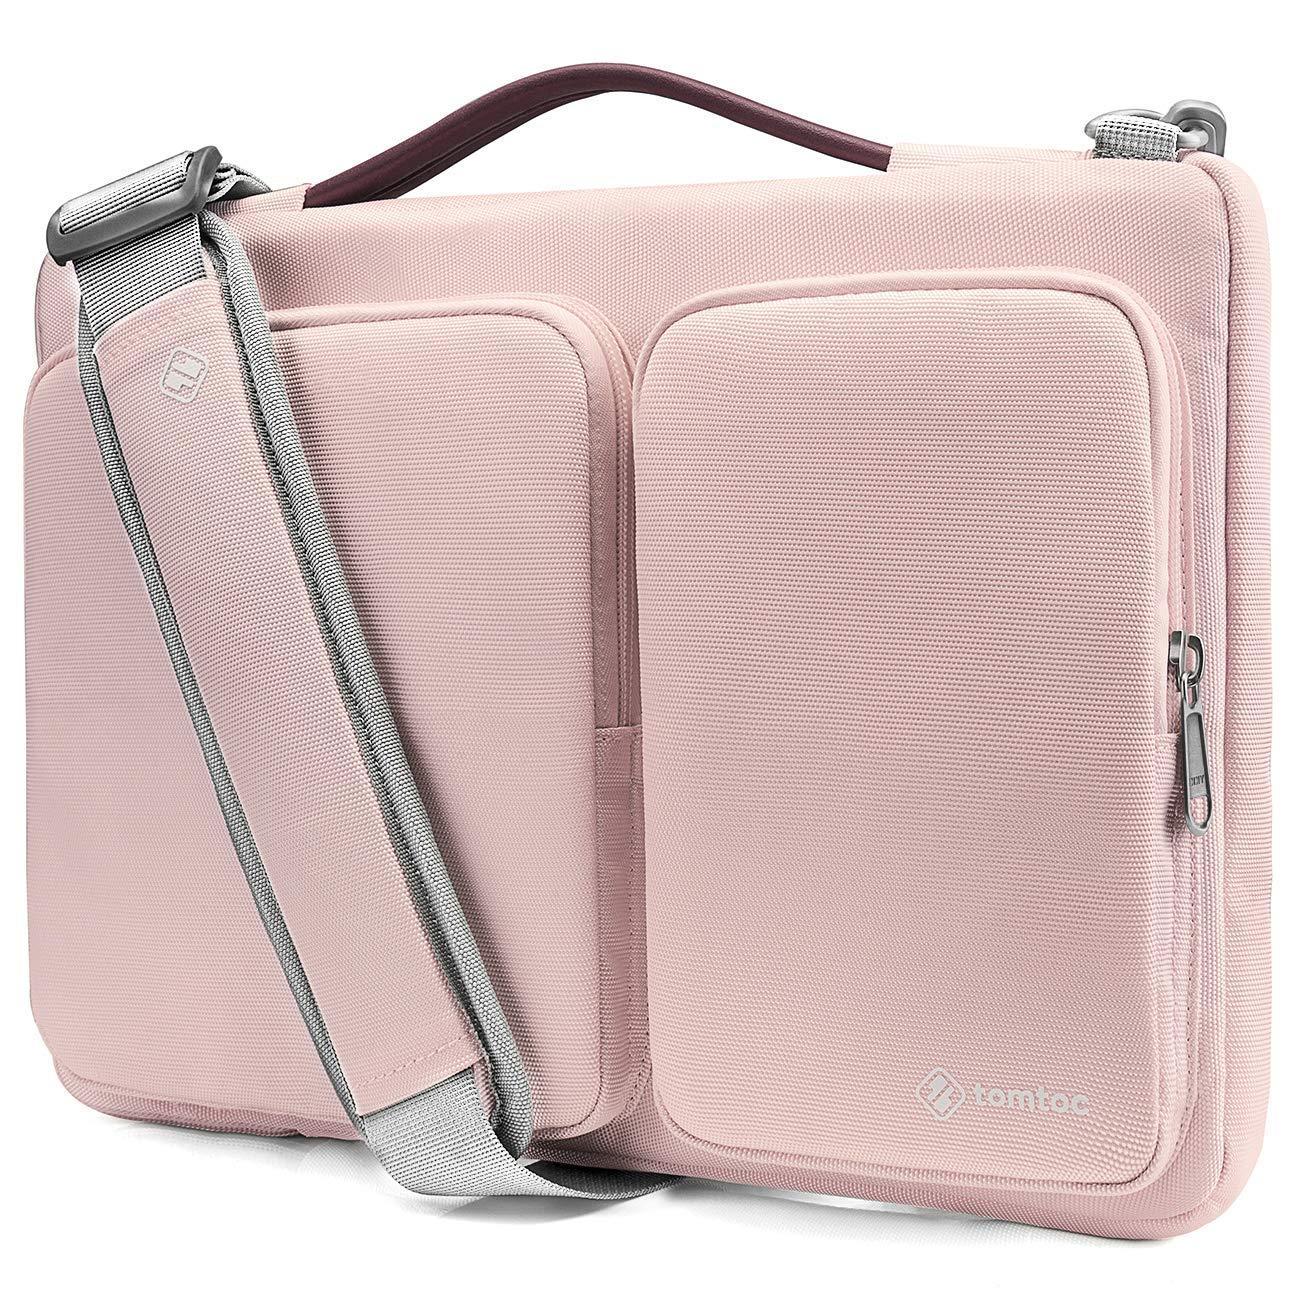 A1990 /& A1707 | Chromebook ThinkPad Acer HP da 14 Pollici tomtoc Custodia 14 Pollici Original Borsa a Tracolla per Laptop per MacBook PRO Touch Bar da 15 Pollici Nero